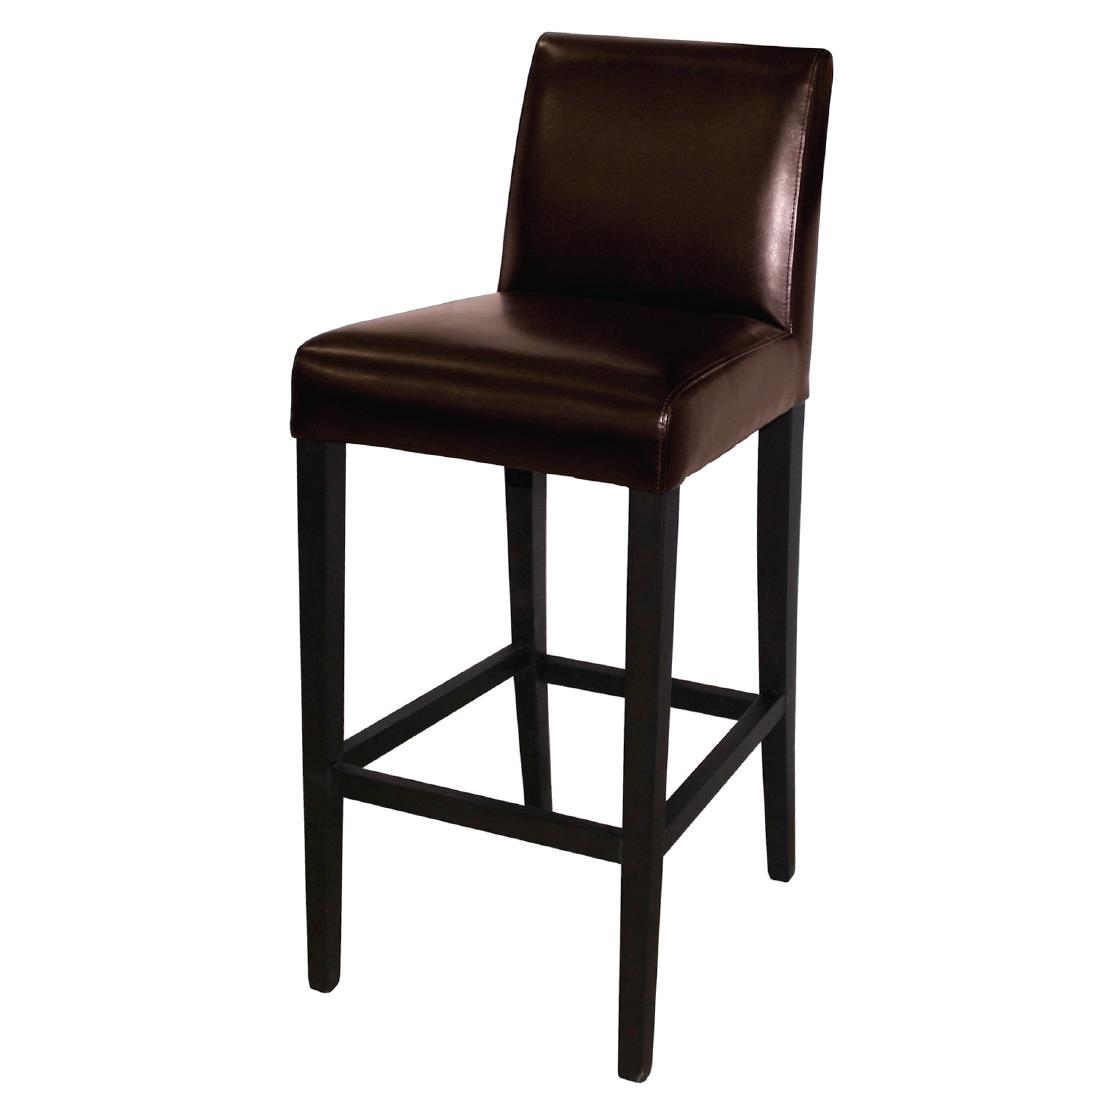 Faux Leather High Chair - Dark Brown